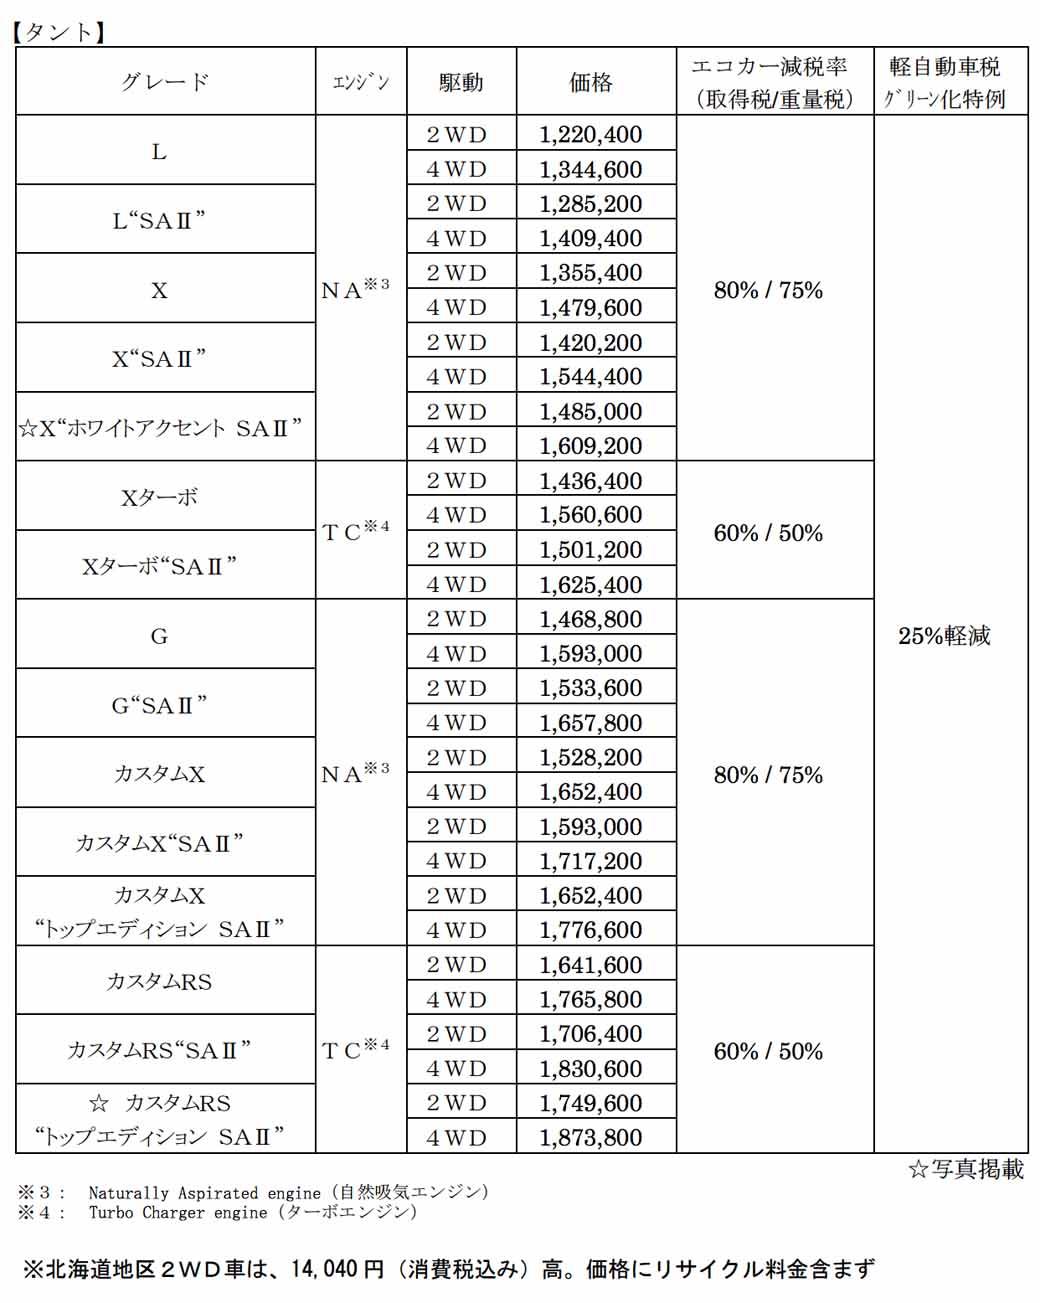 daihatsu-and-revamped-the-interior-and-exterior-design-perform-tanto-minor-change20151214-3